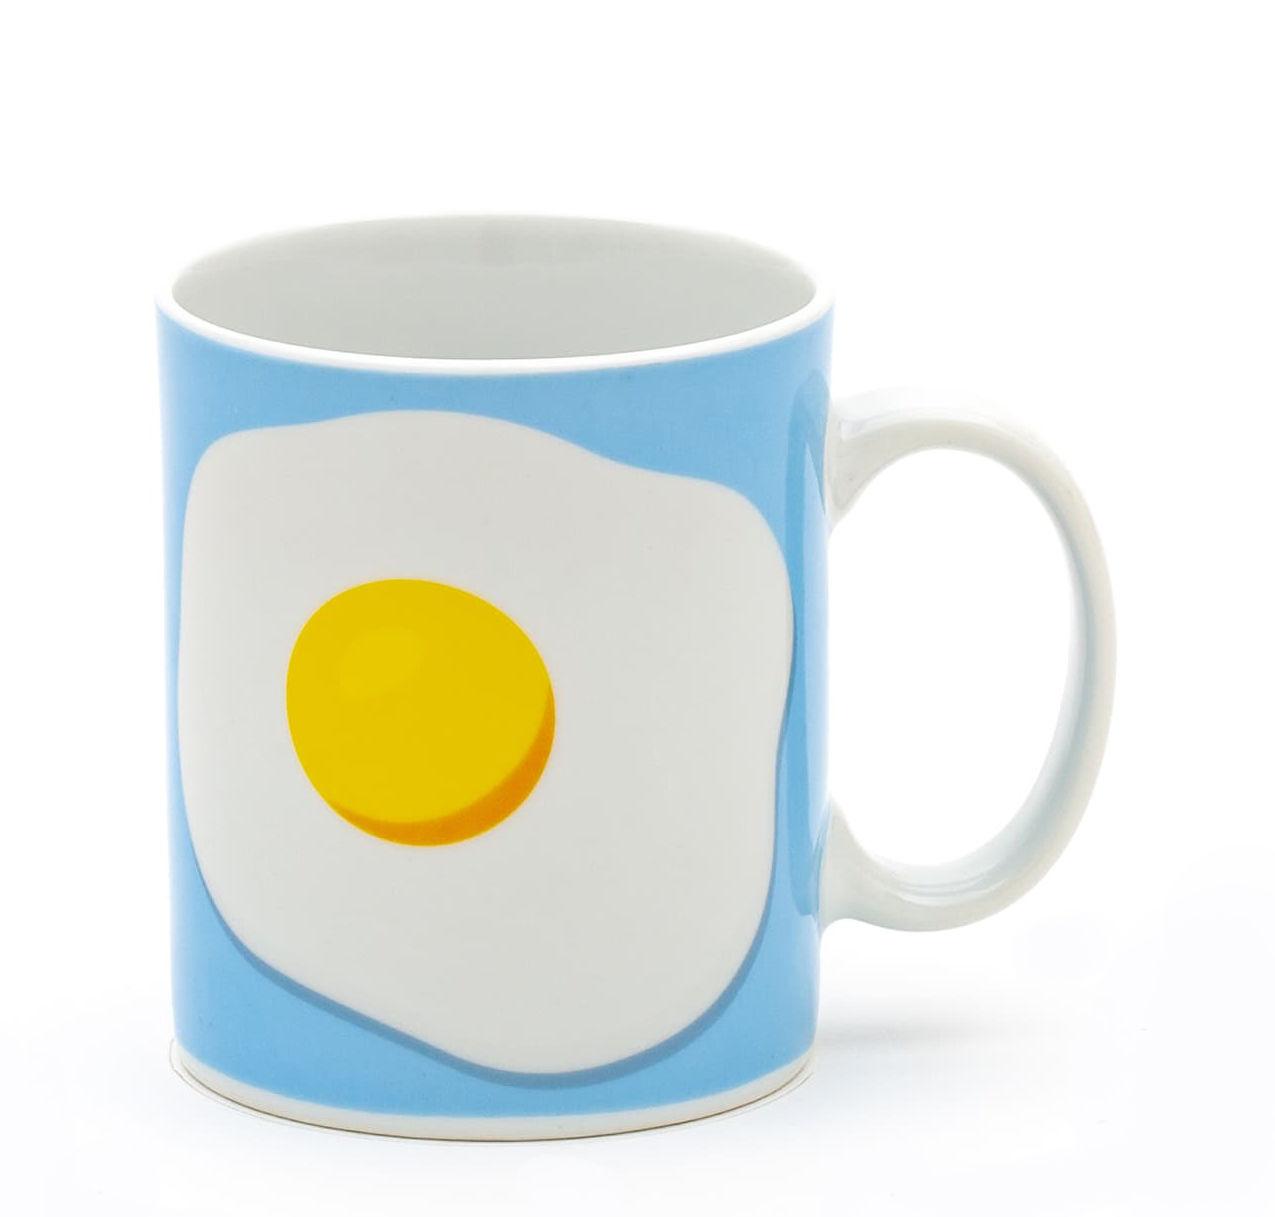 Tableware - Coffee Mugs & Tea Cups - Œuf Mug - / Porcelain by Seletti - Egg - China